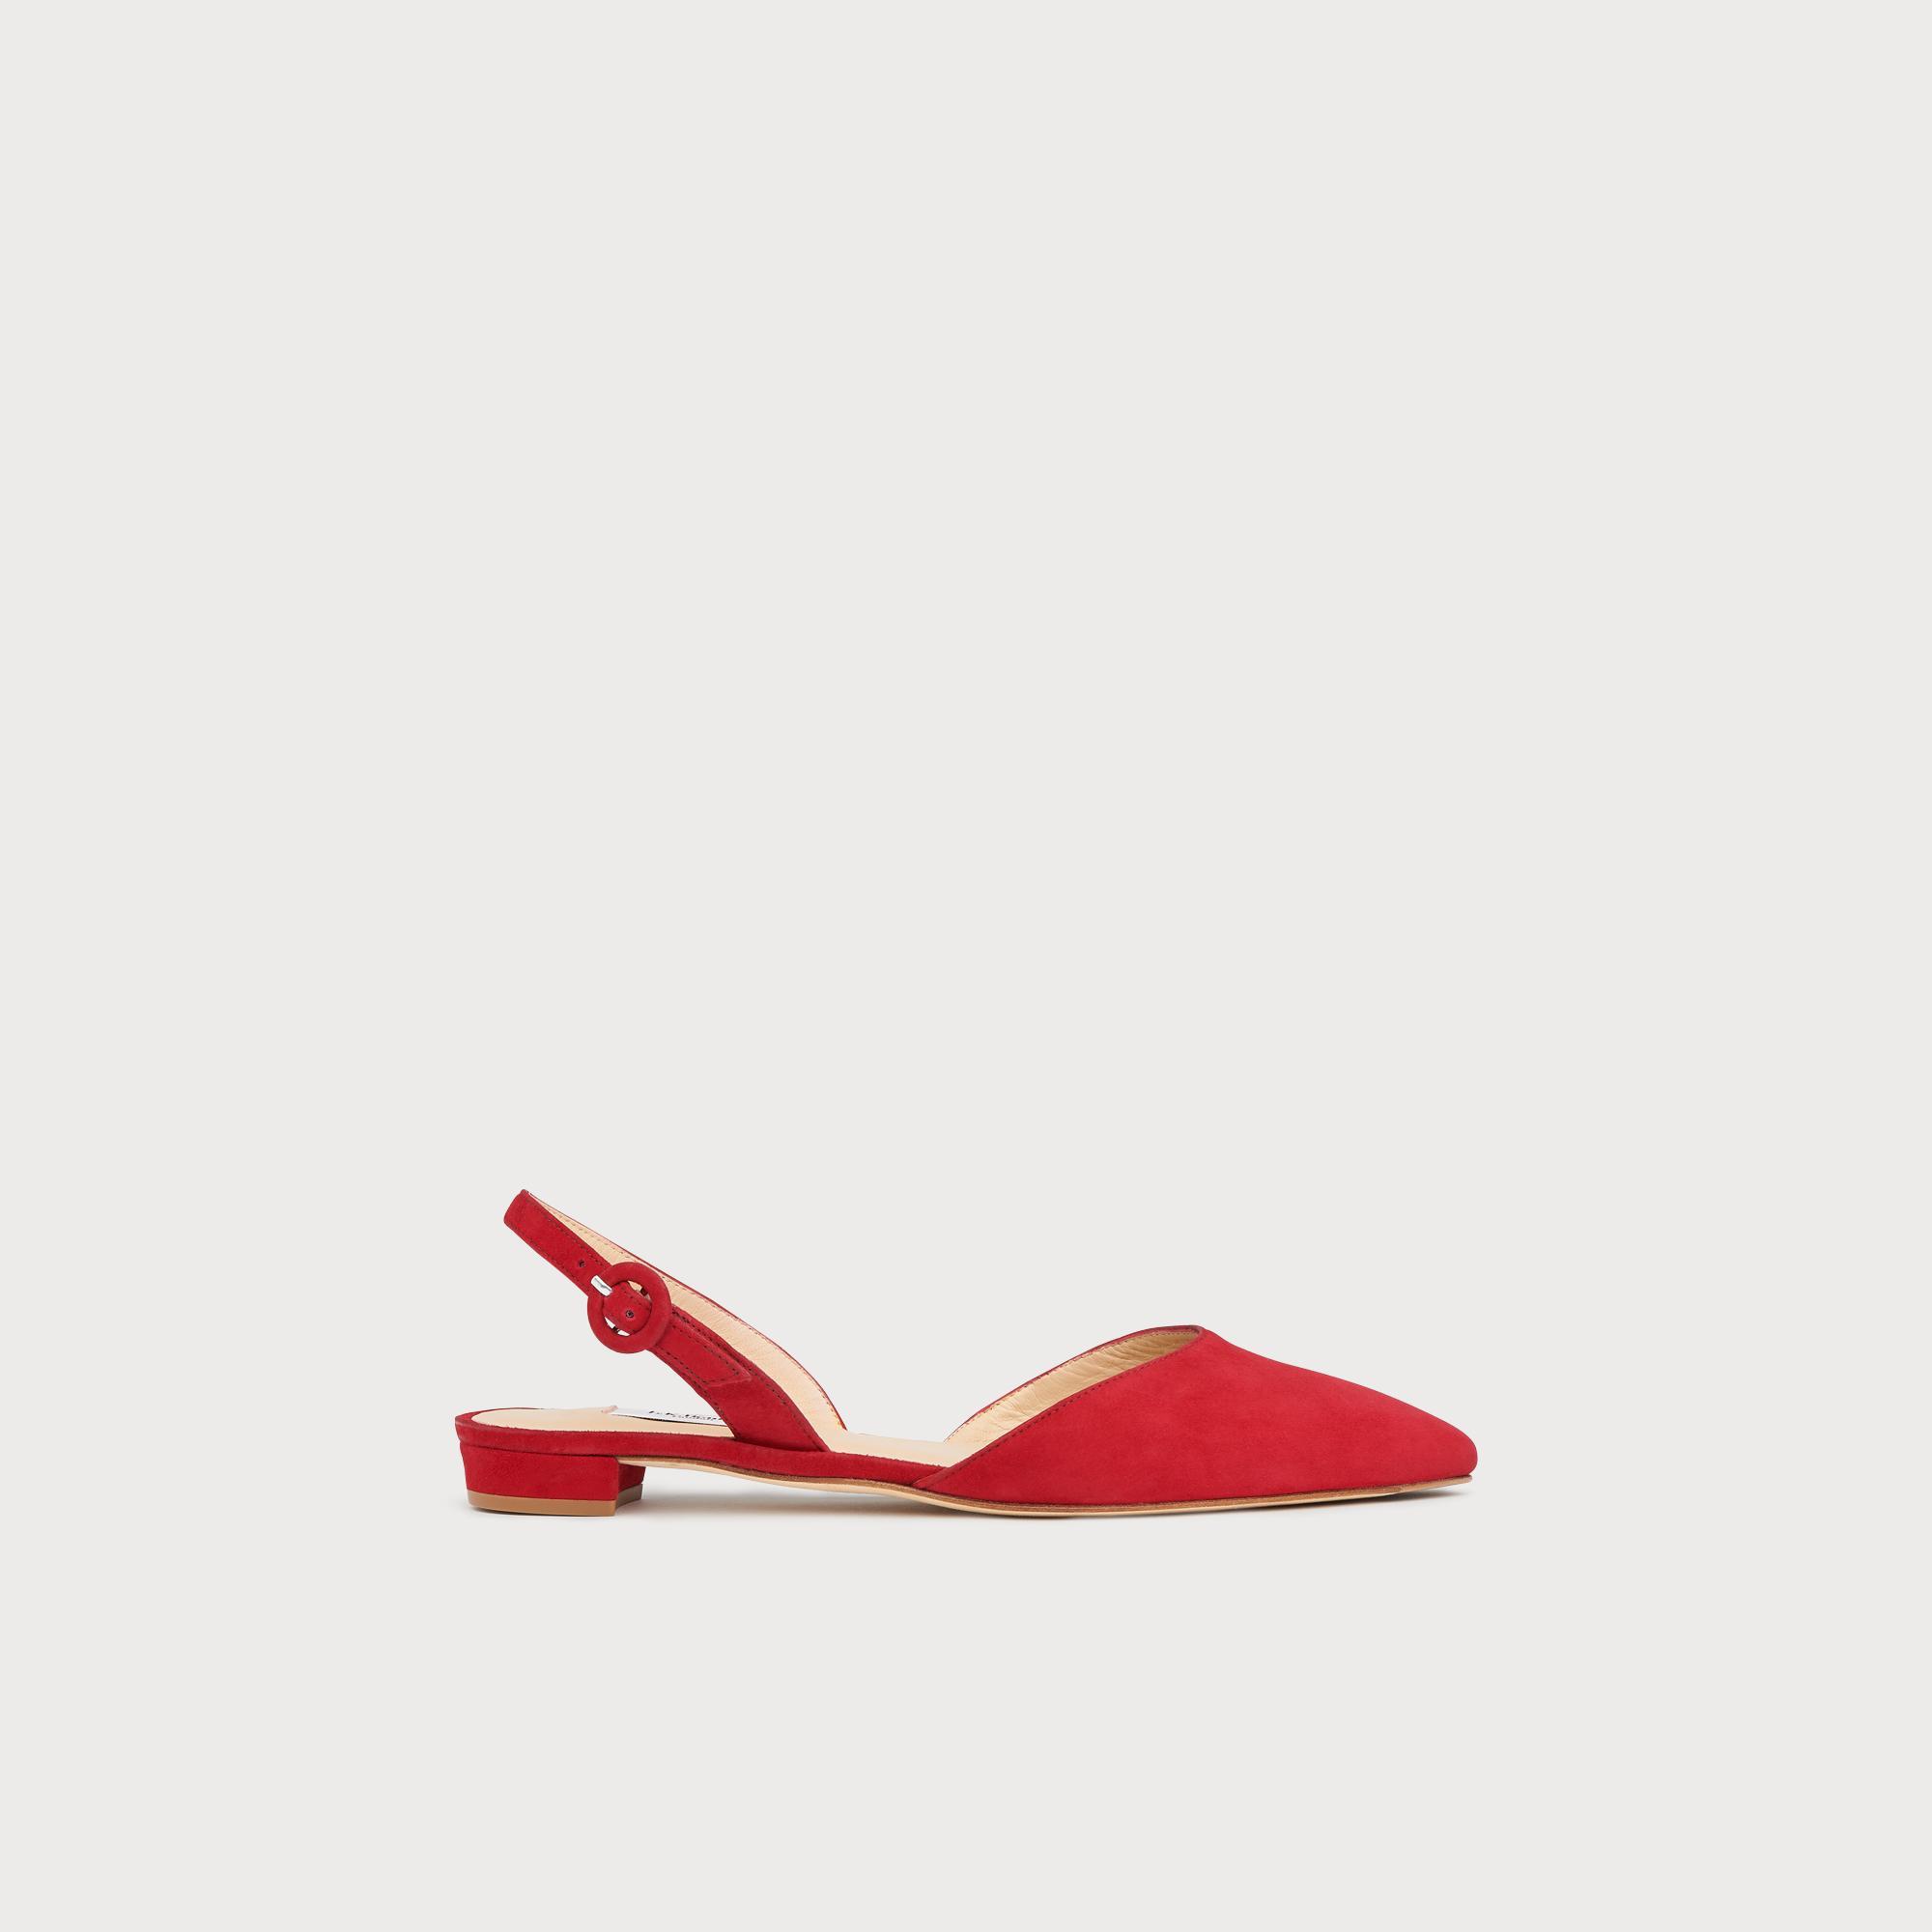 5d069ca16fe30 Leanne Red Suede Flat Slingbacks | Shoes | L.K.Bennett